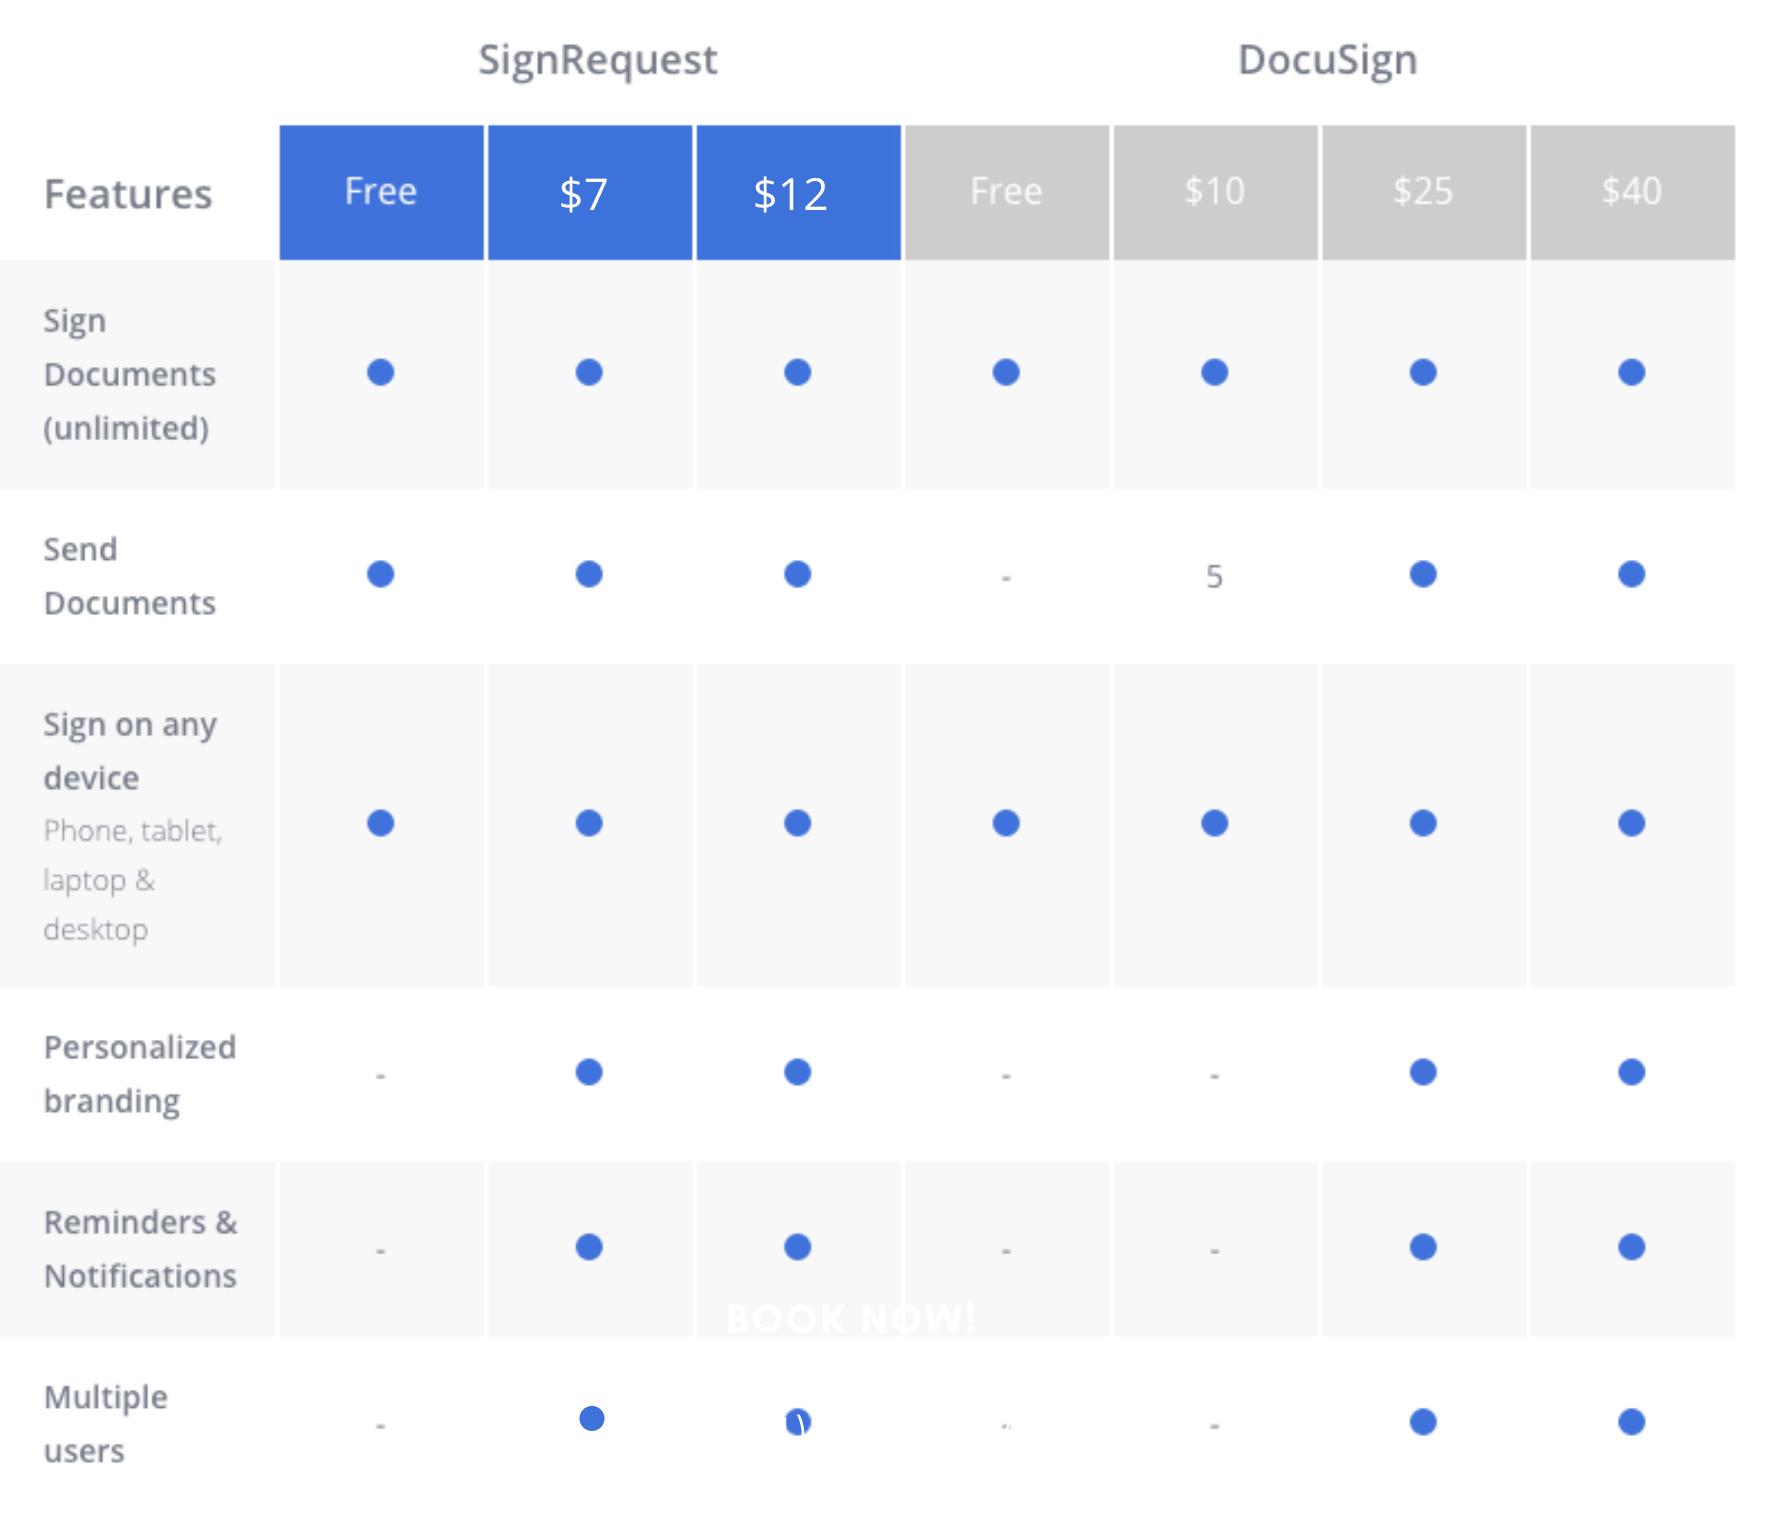 SignRequest vs DocuSign feature comparison